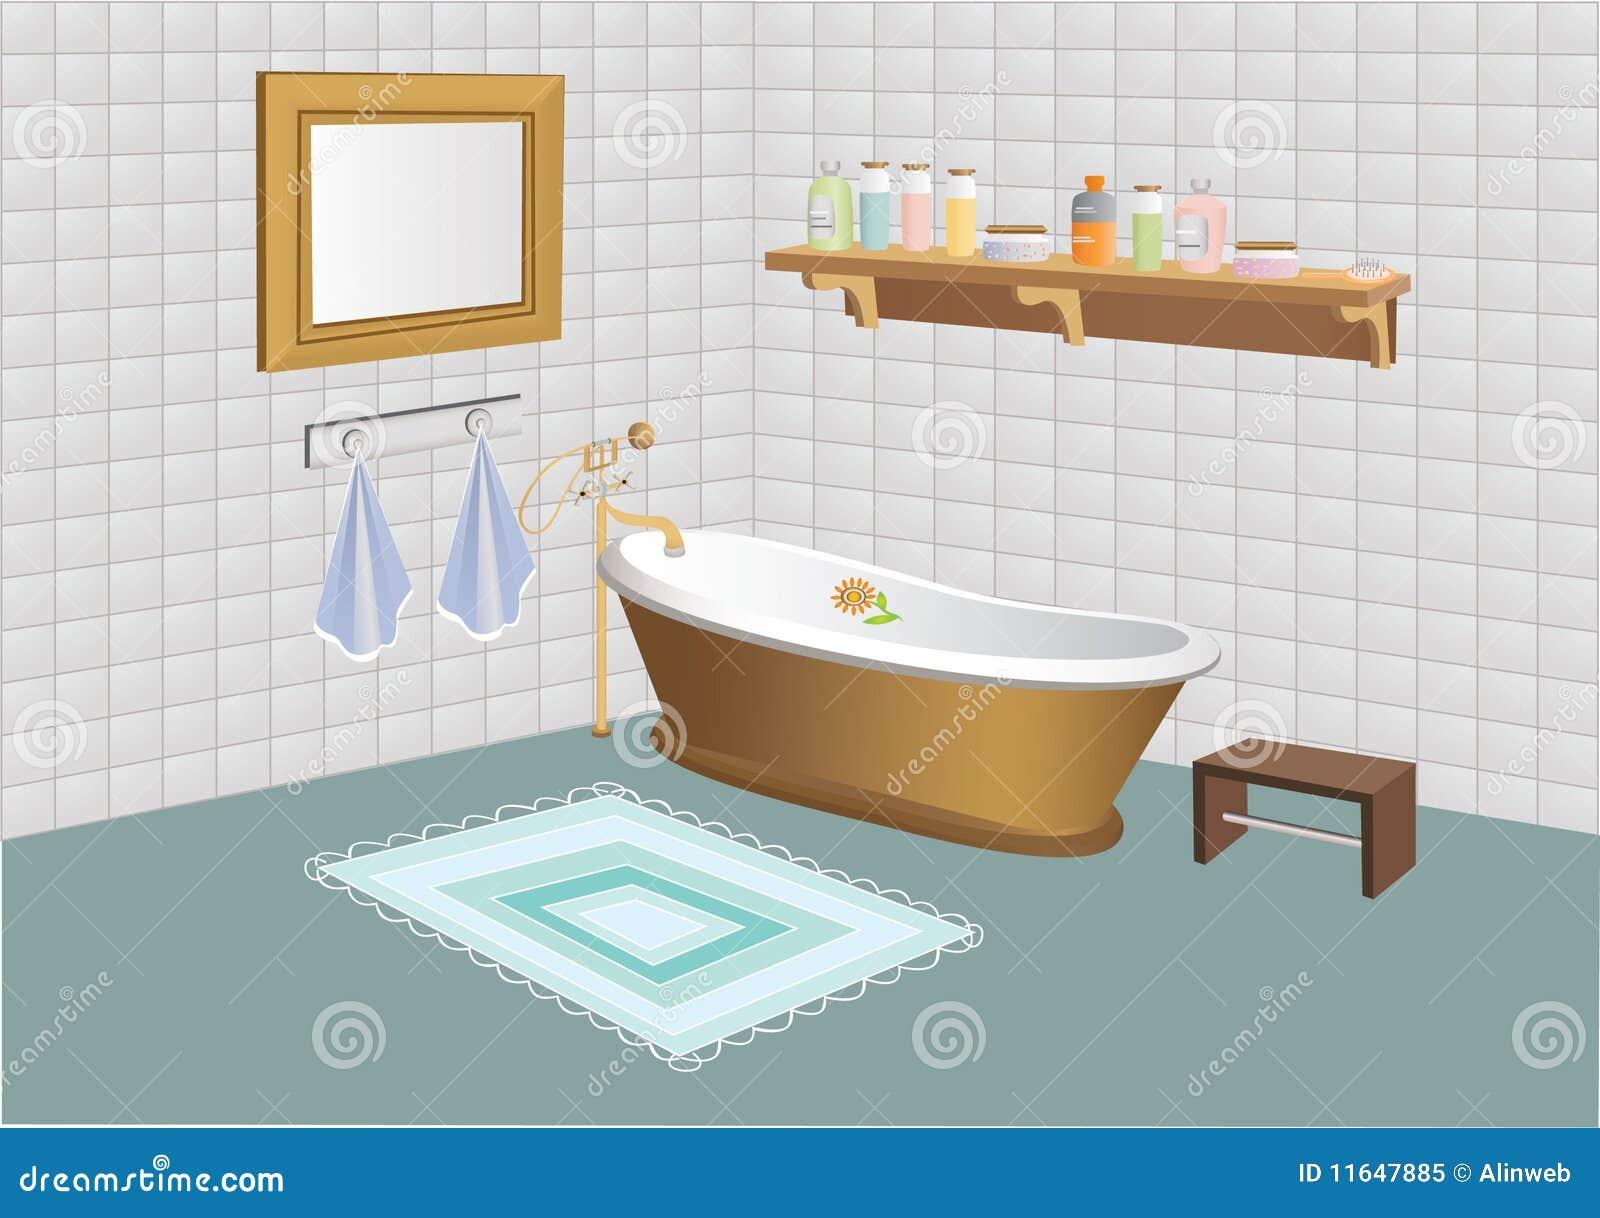 Vector illustration of bathroom royalty free stock photo image 11647885 - Image of bathroom ...